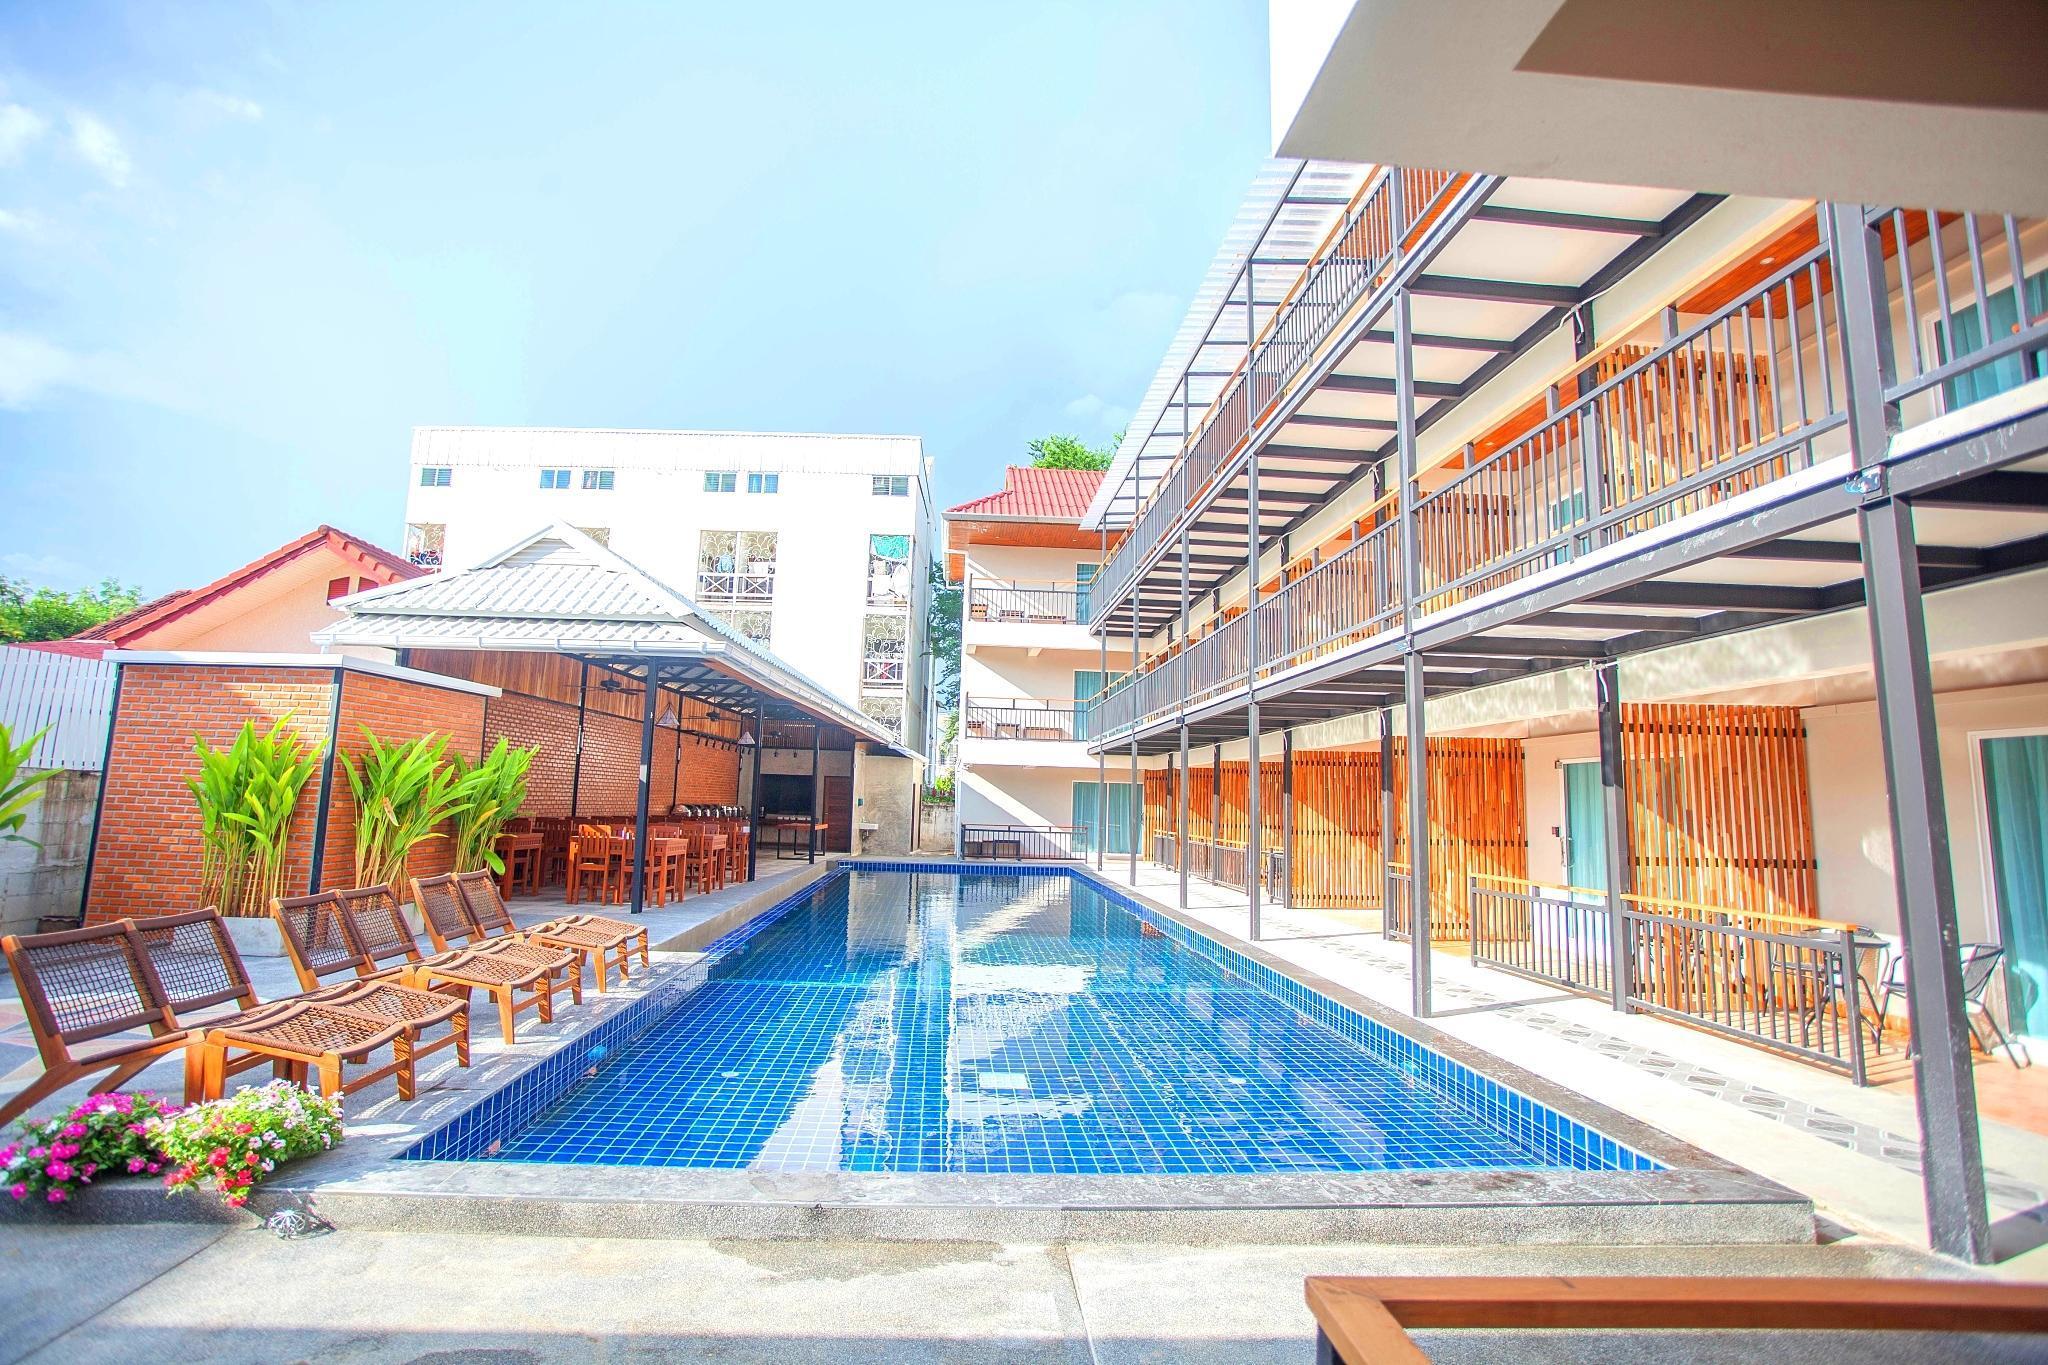 Celosia Chiang Mai